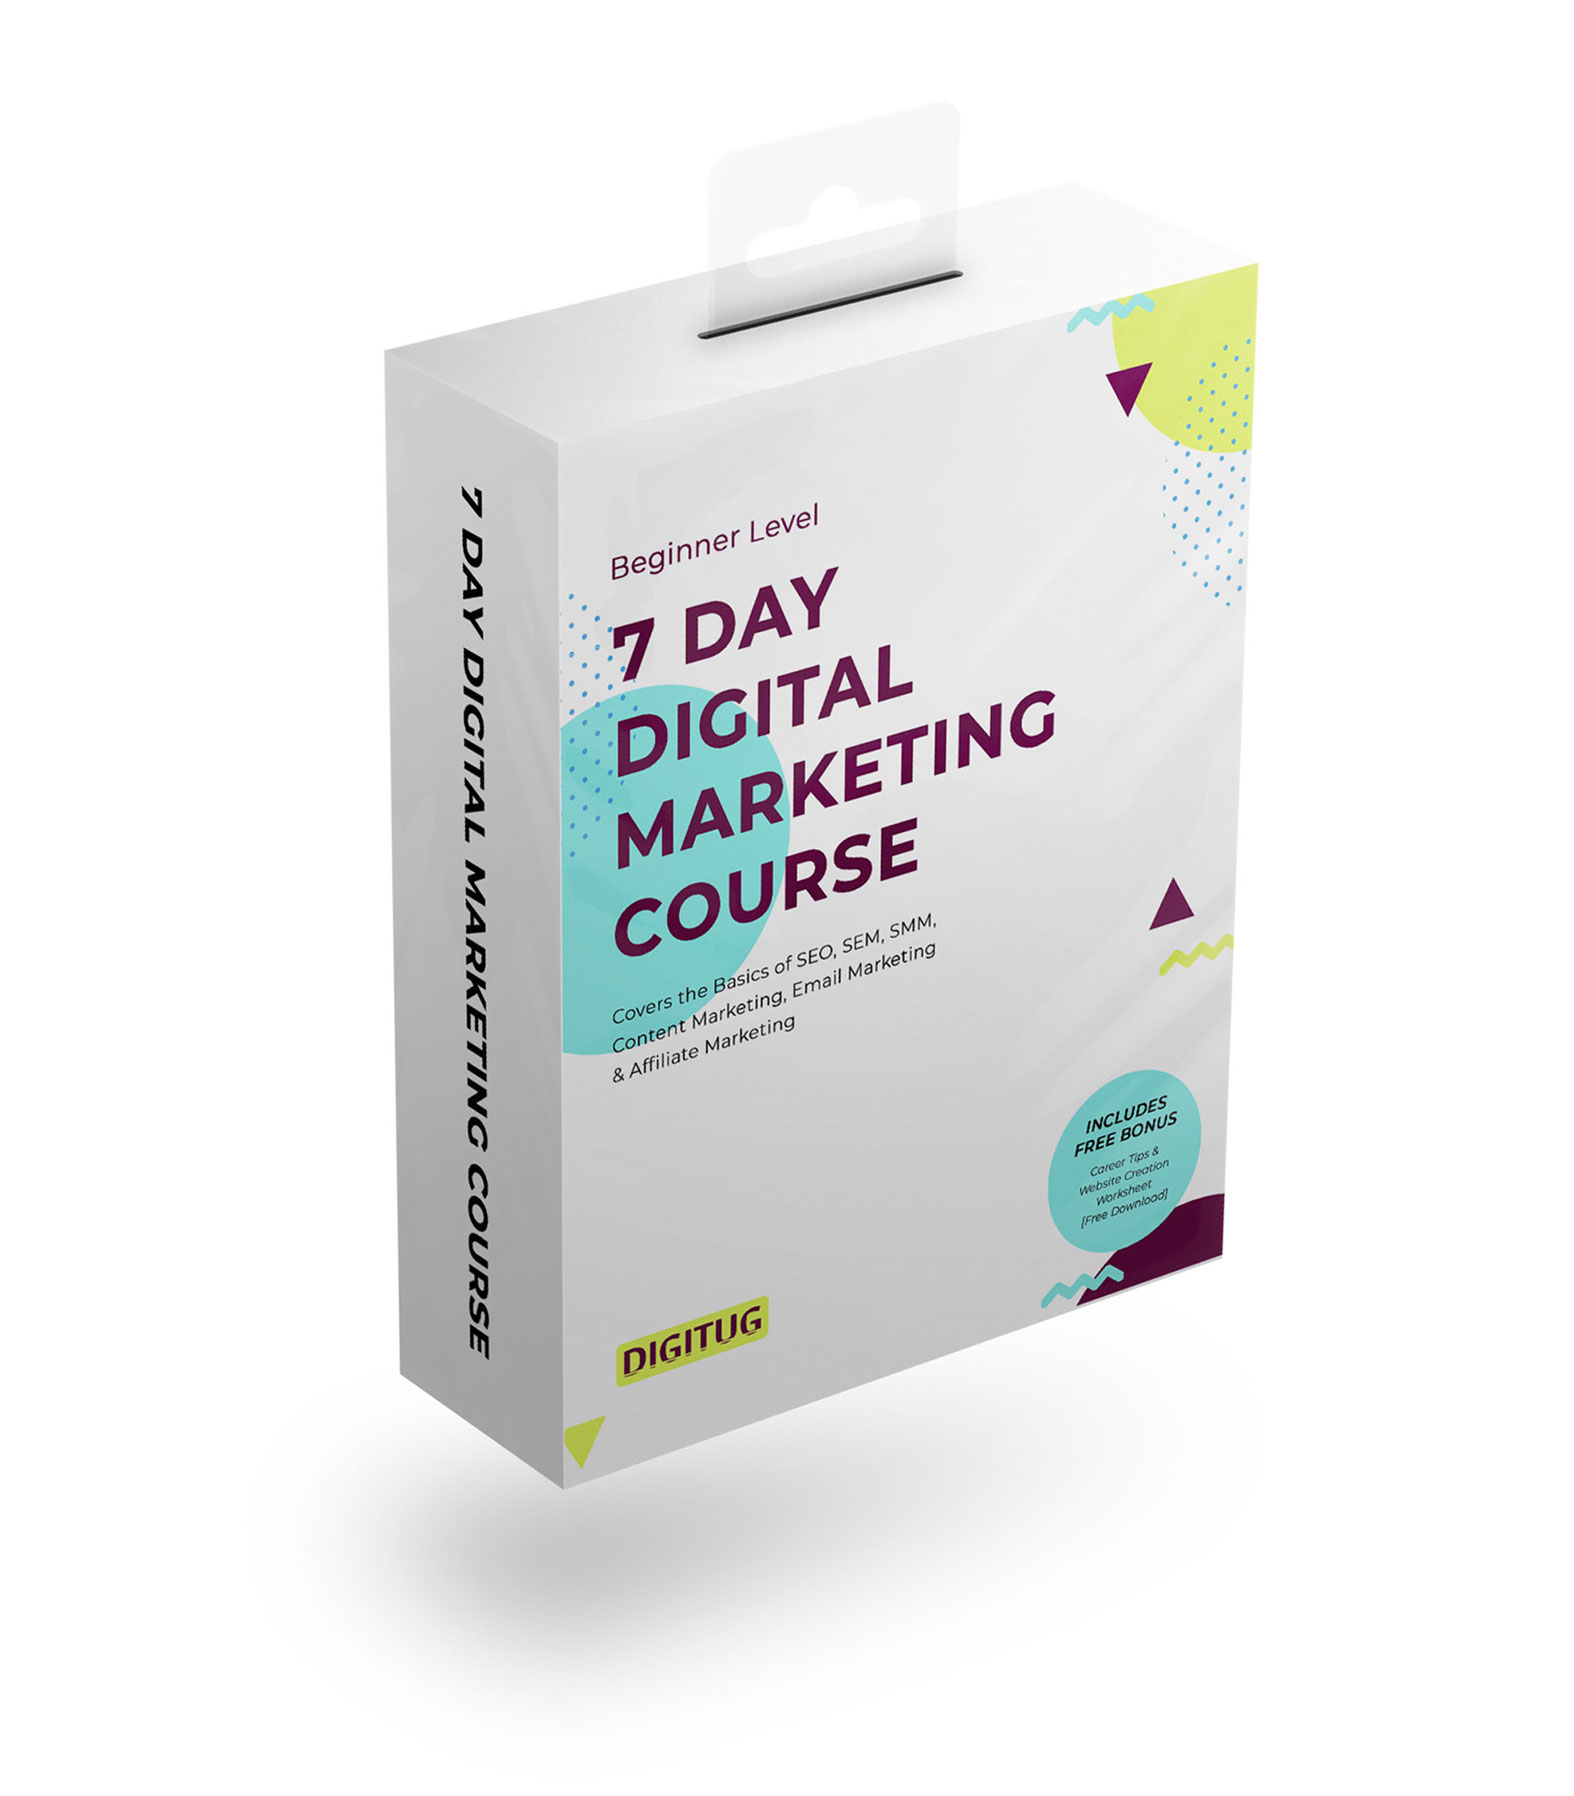 7-Day-Digital-Marketing-Course-Bundle